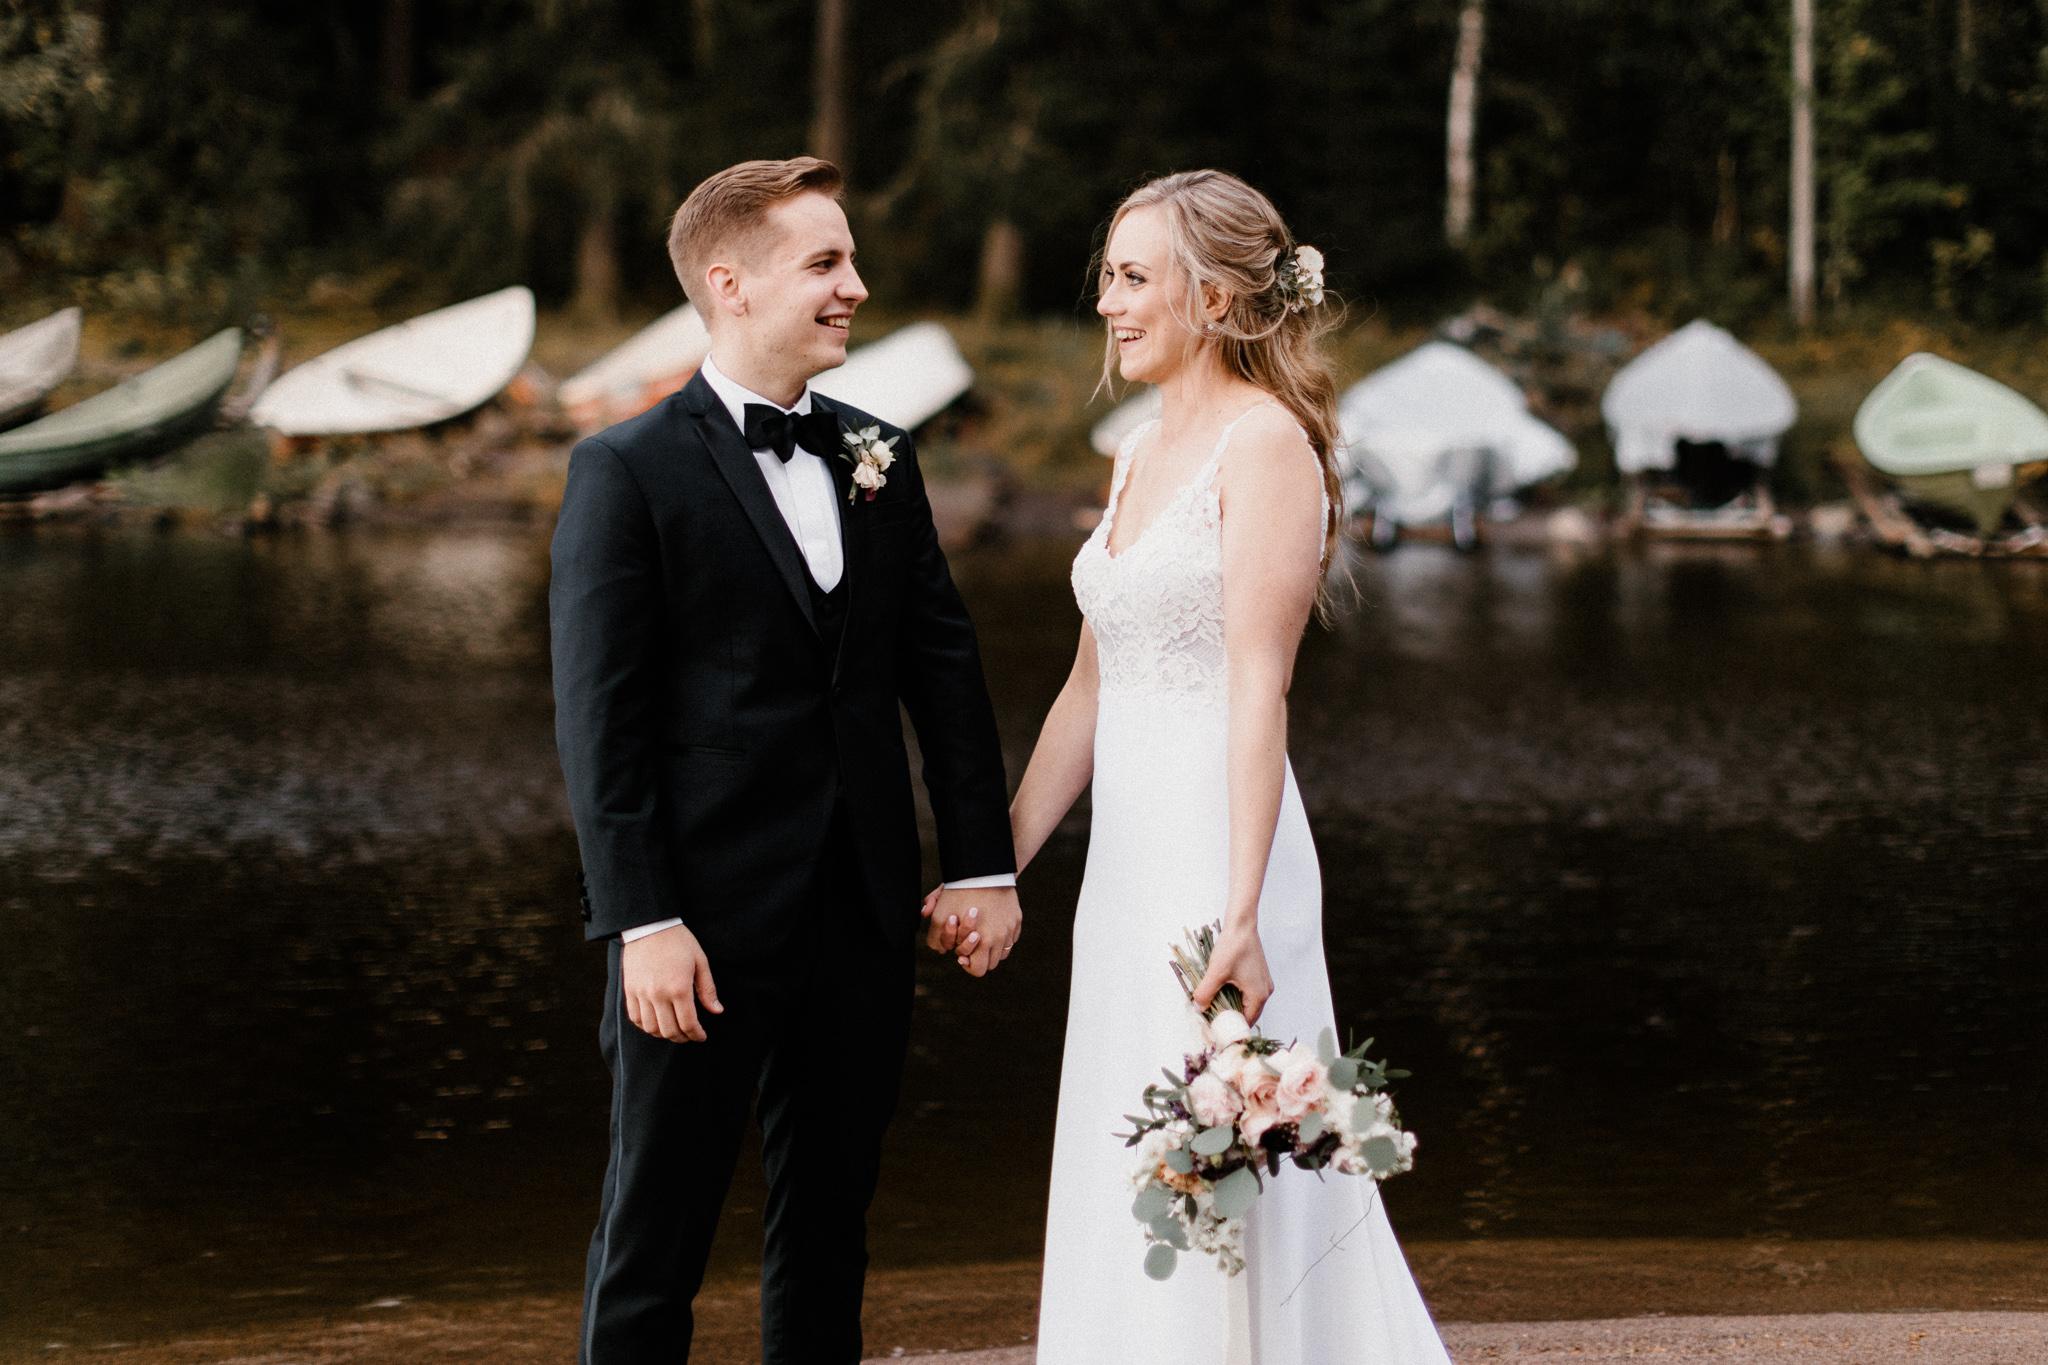 Johanna + Mikko - Tampere - Photo by Patrick Karkkolainen Wedding Photographer-171.jpg